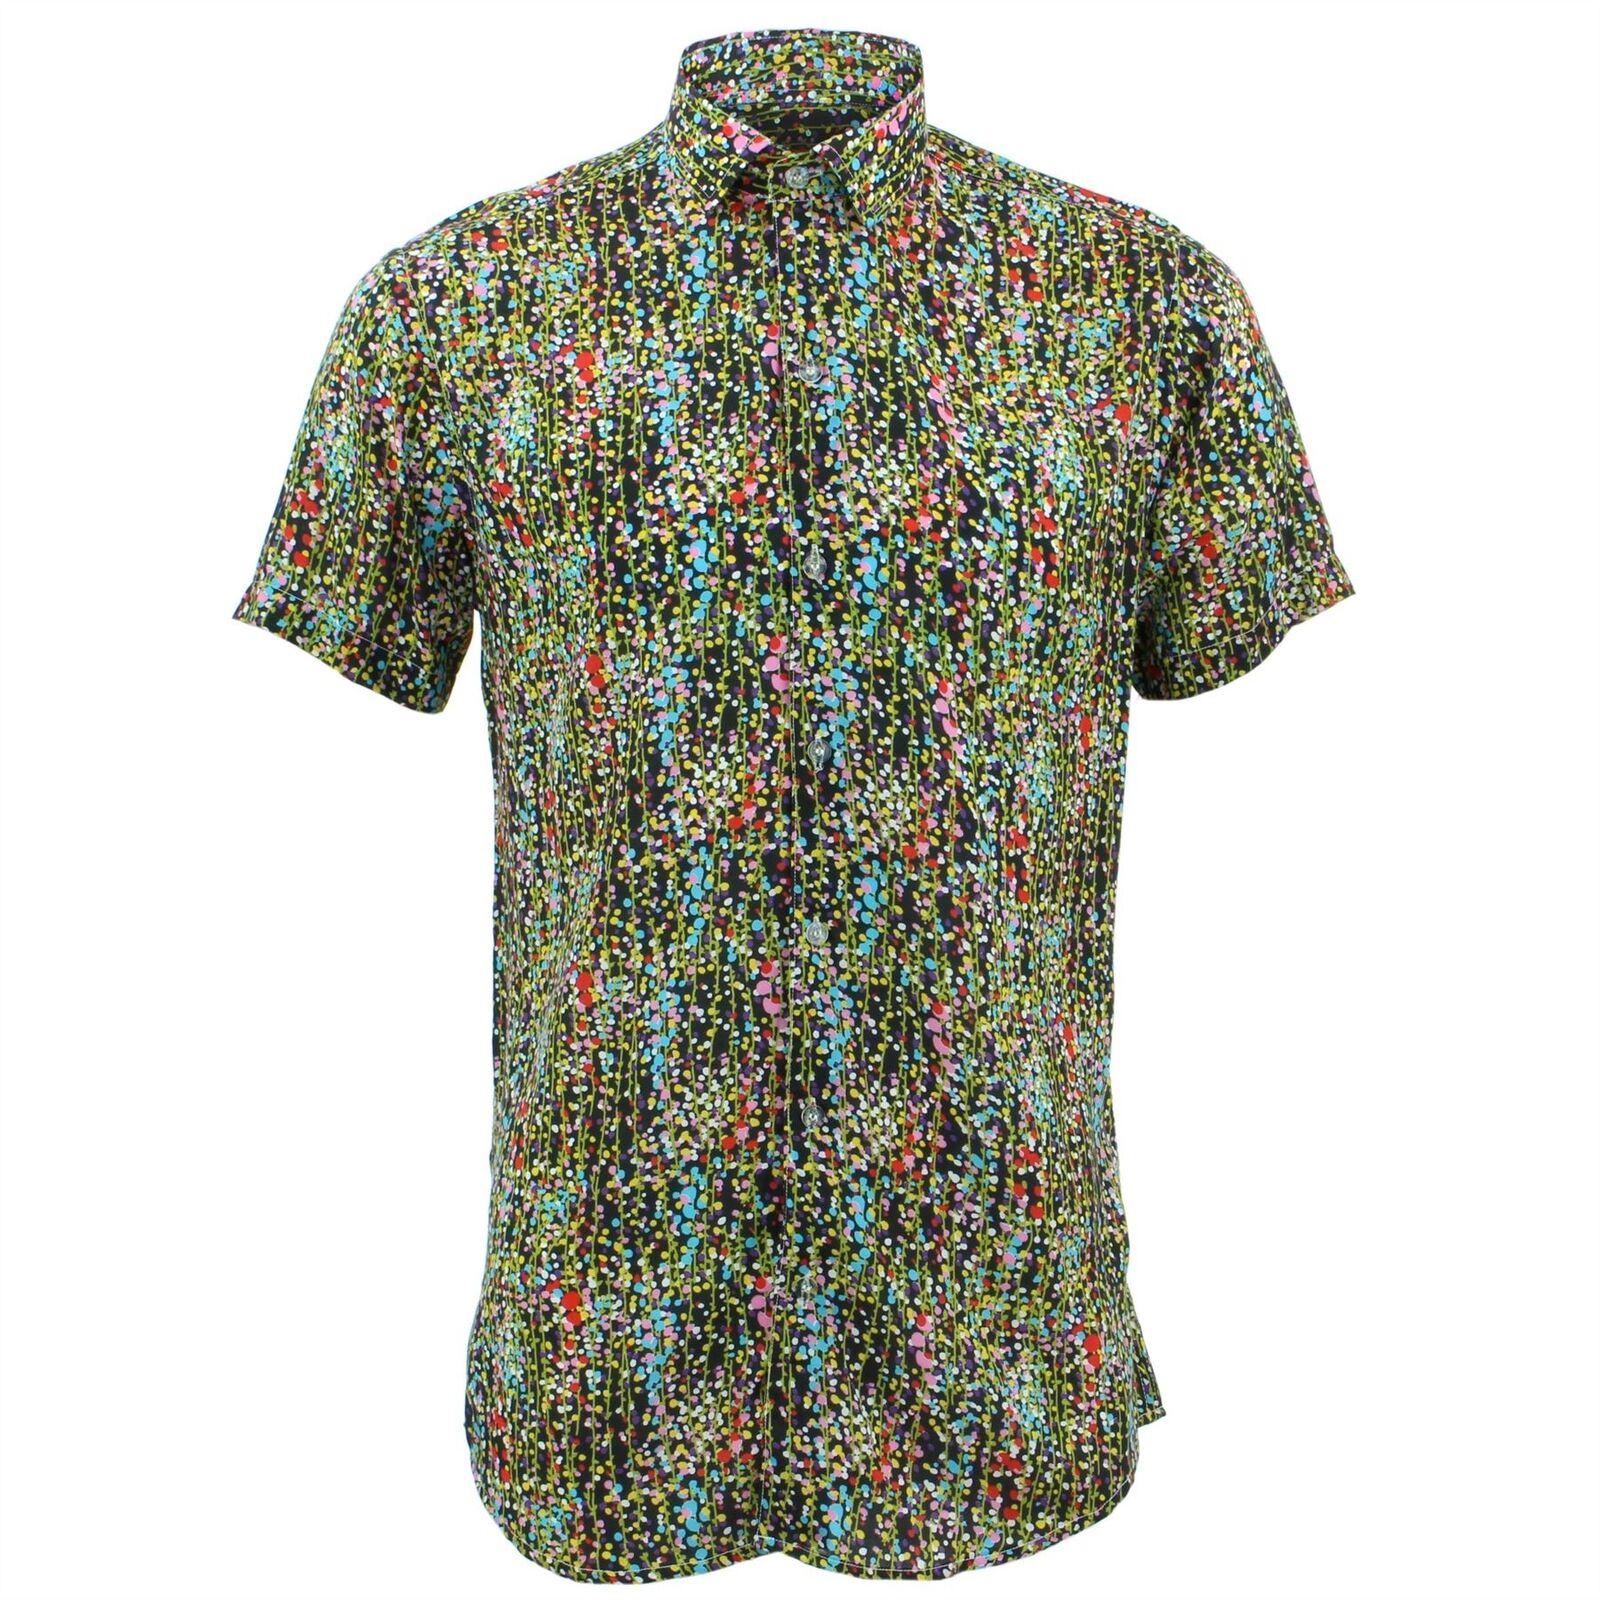 Herren Shirt Loud Originals Originals Originals Enganliegend Ditzy Retro Psychedelic Fancy | Förderung  | Offizielle Webseite  | Stil  f545eb